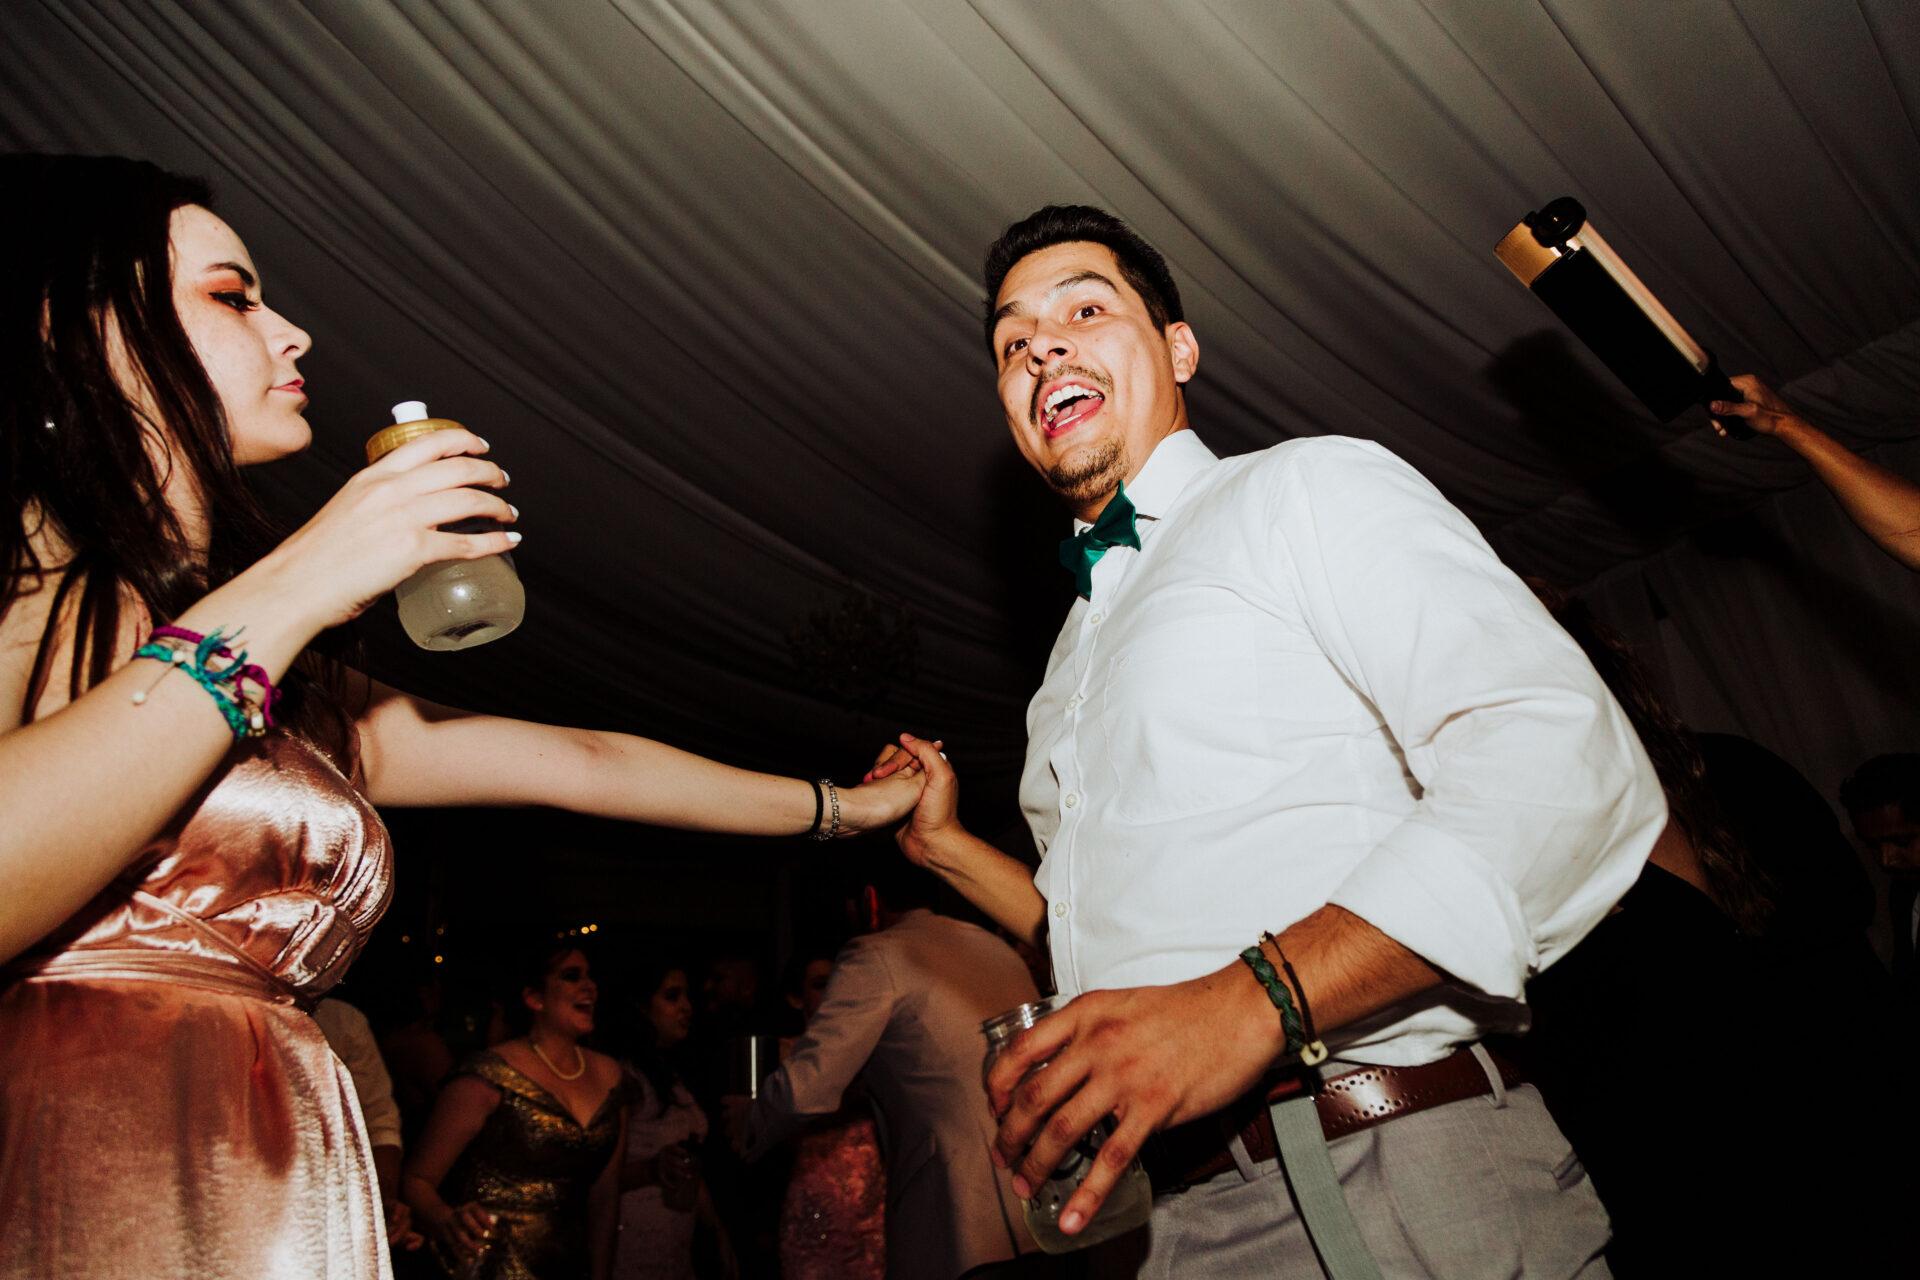 javier_noriega_fotografo_bodas_torreon_coahuila_zacatecas_wedding_photographer63a